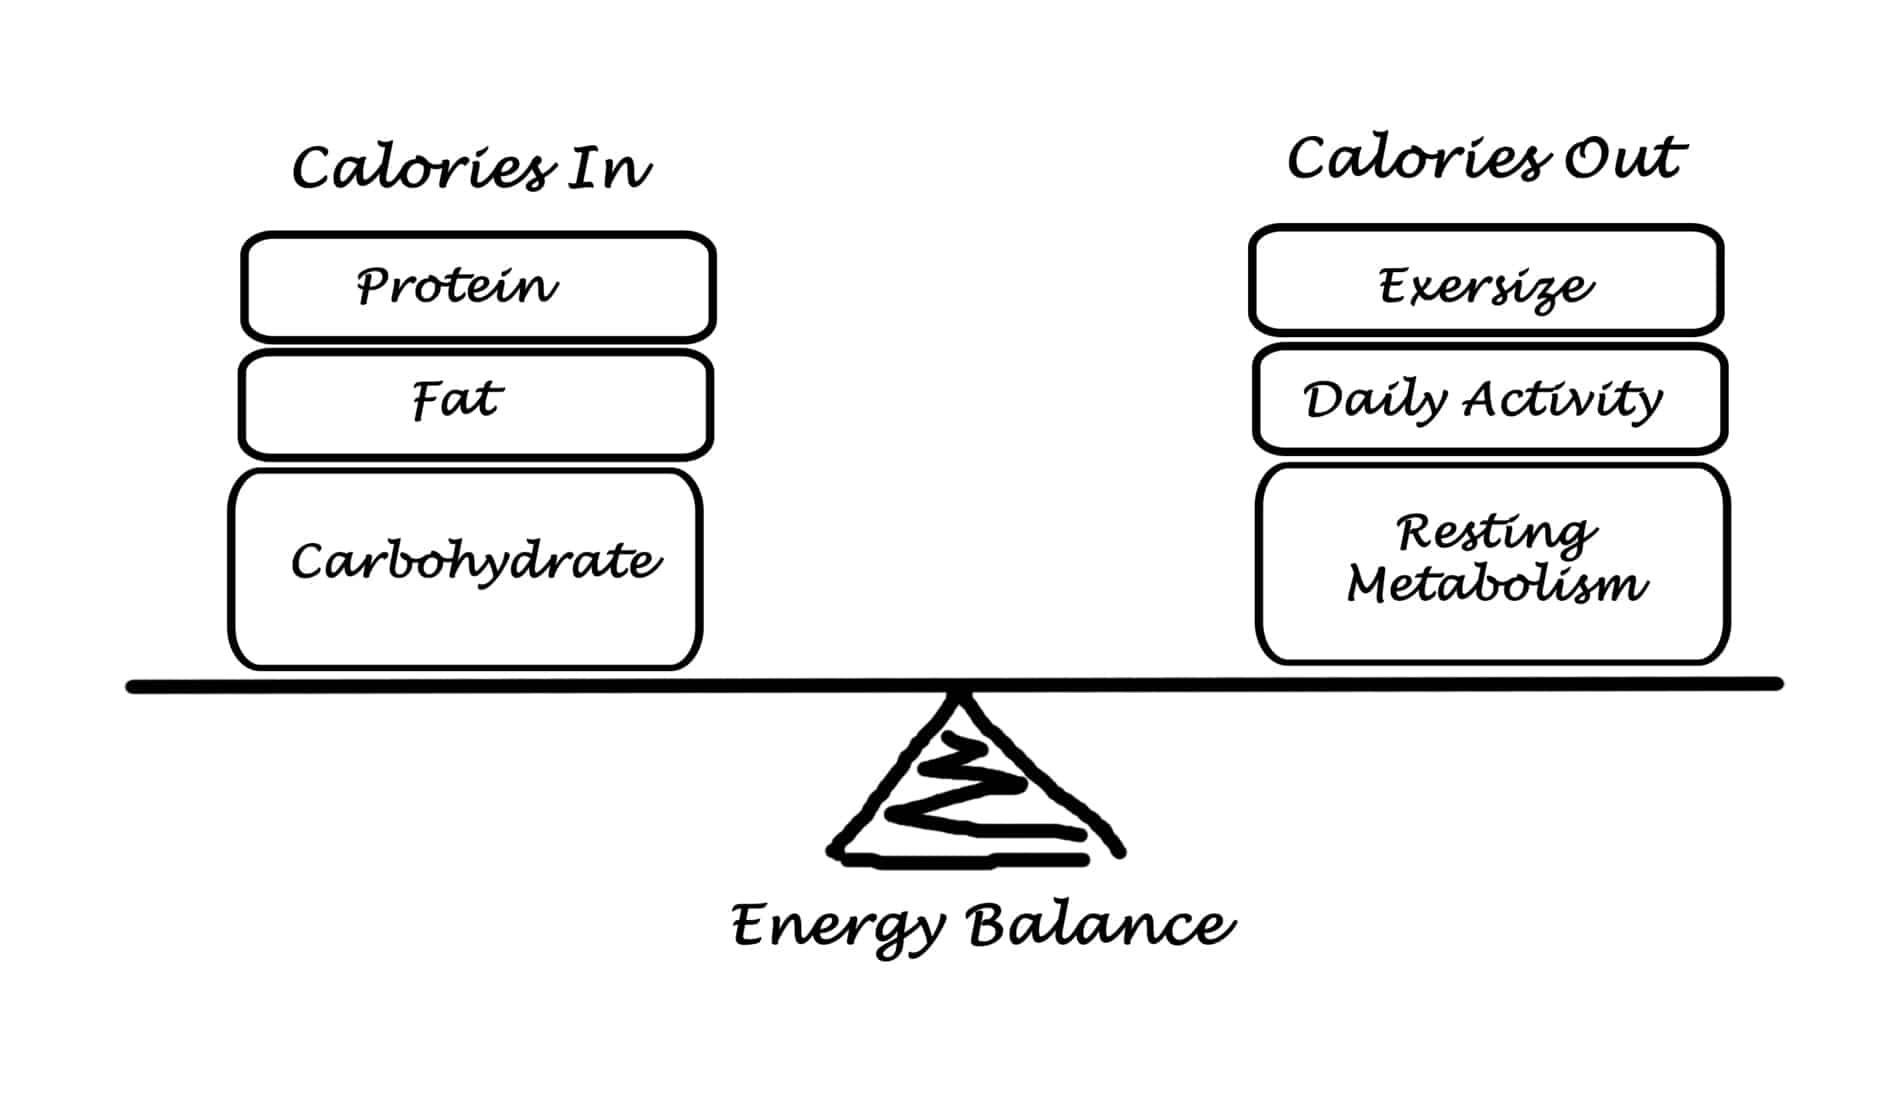 energy balance and tdee calculator